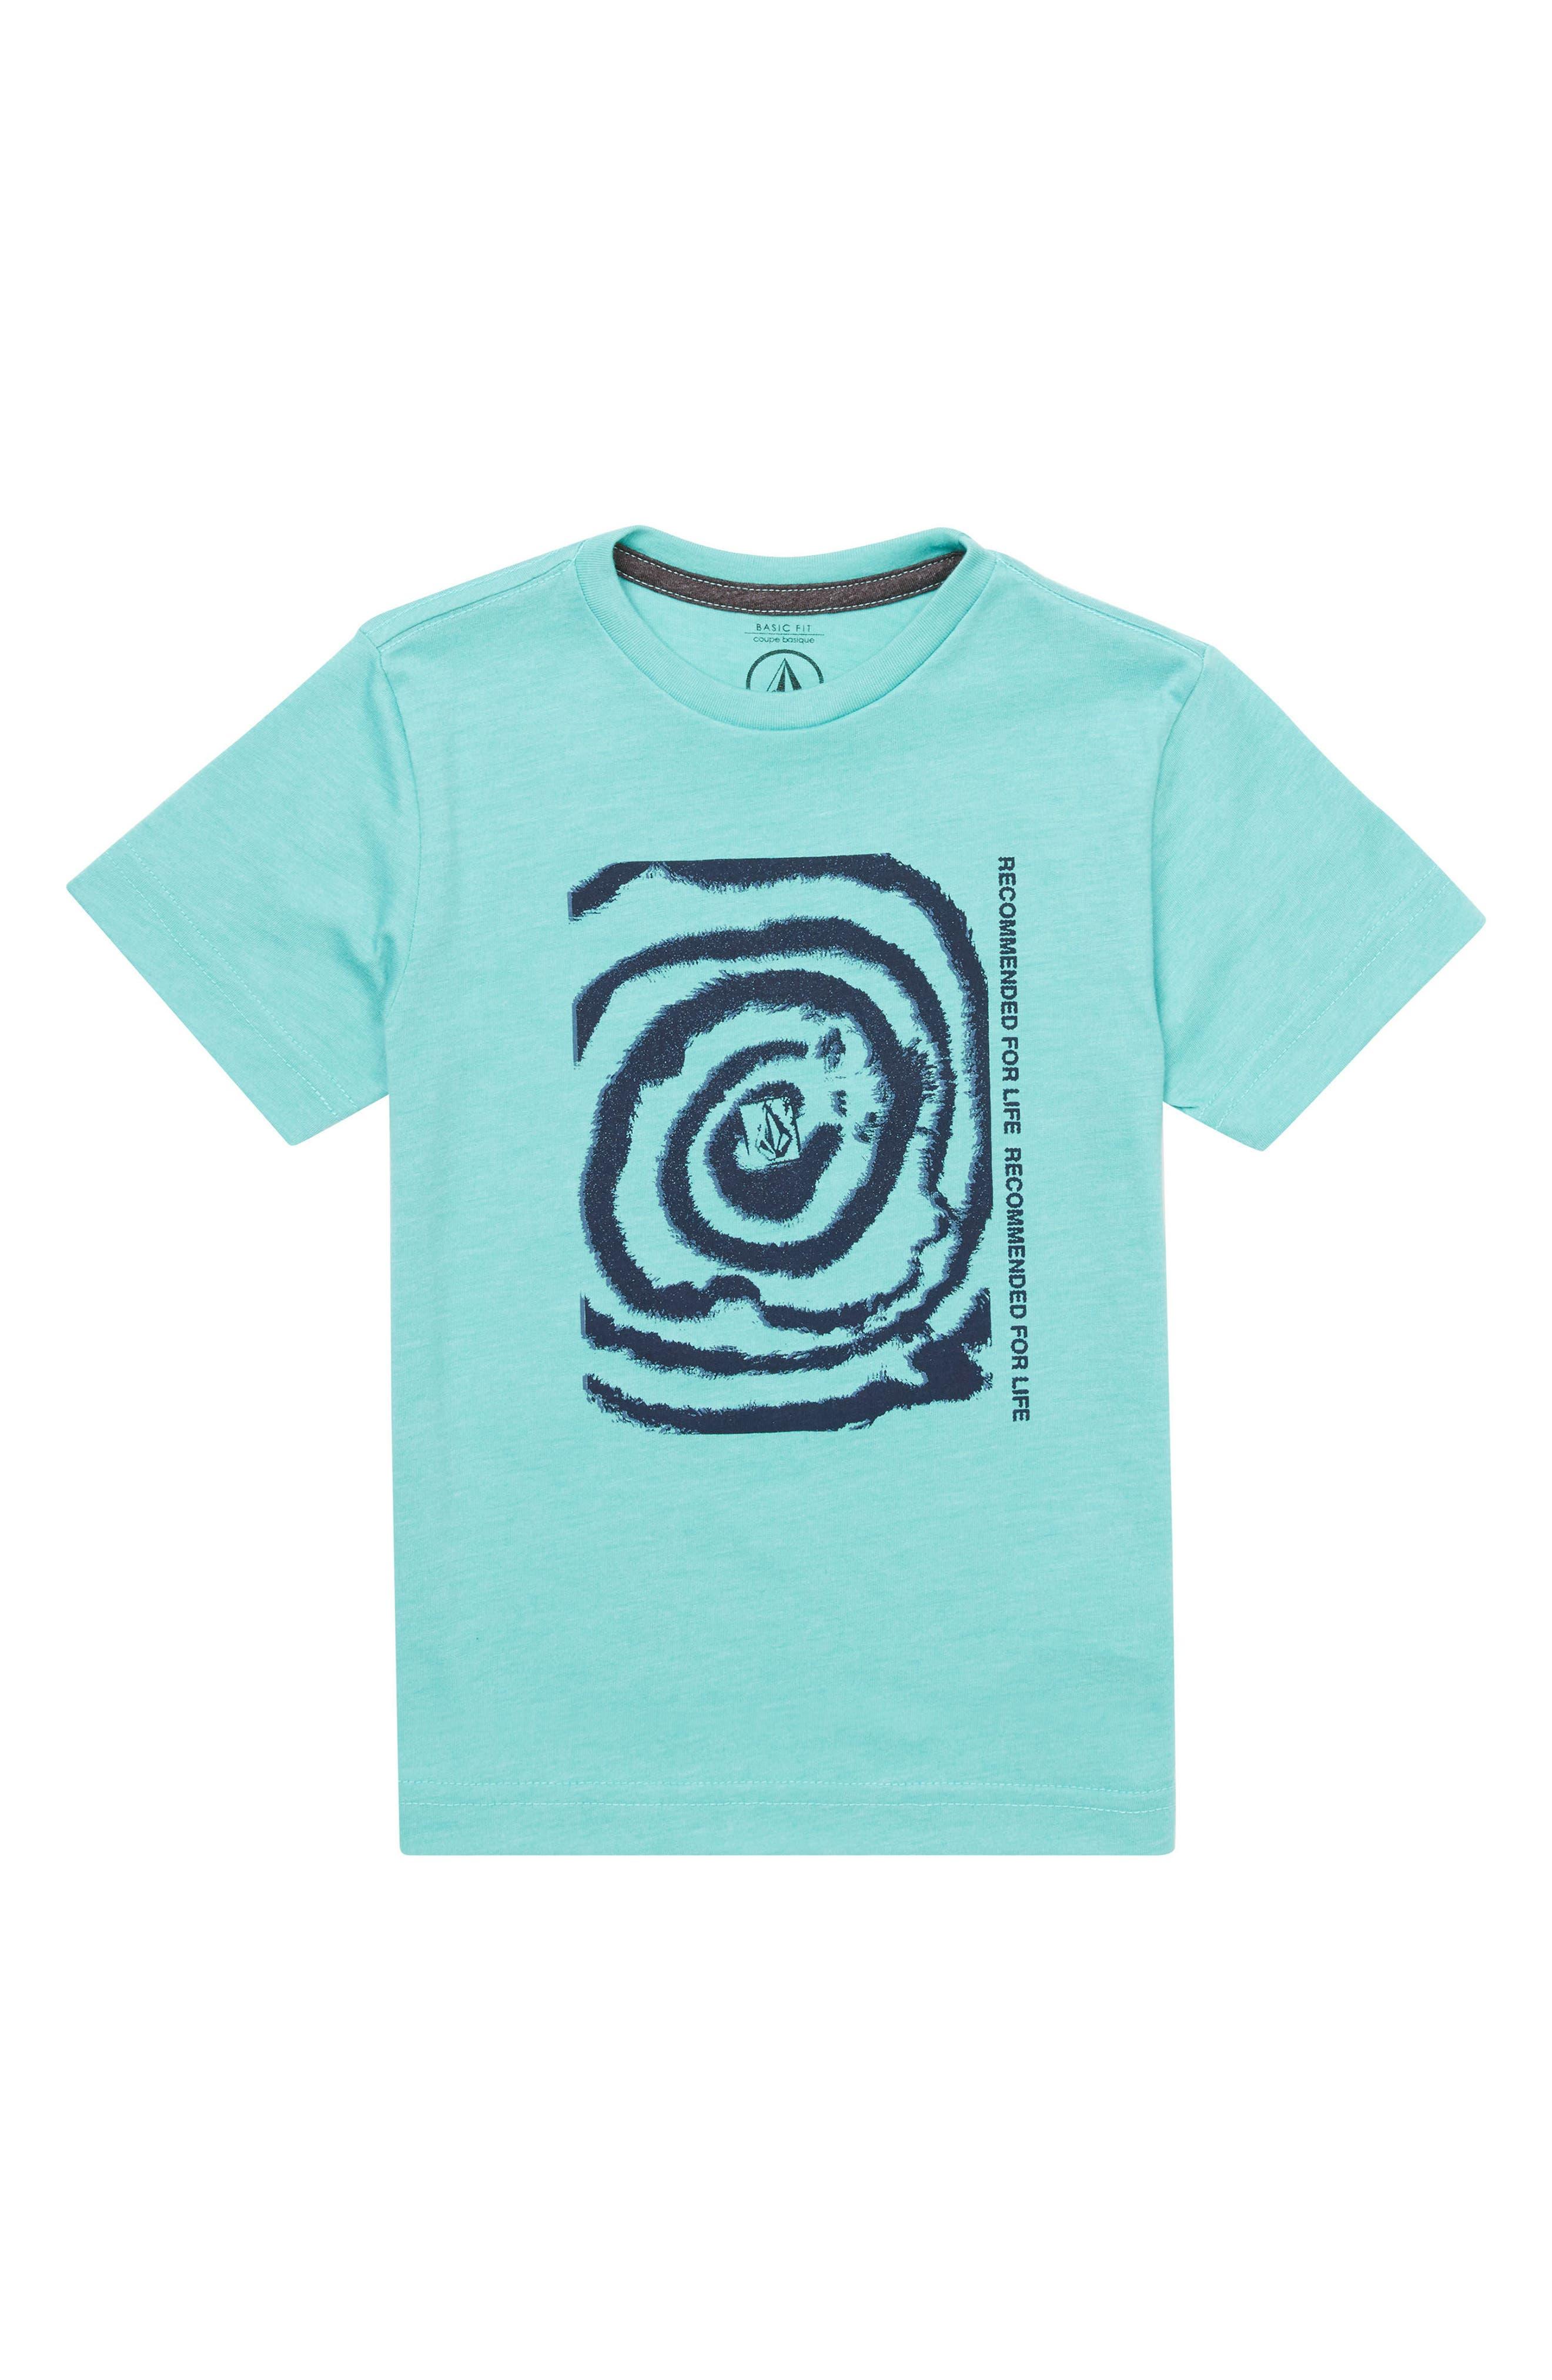 Main Image - Volcom Maag Graphic T-Shirt (Toddler Boys & Little Boys)